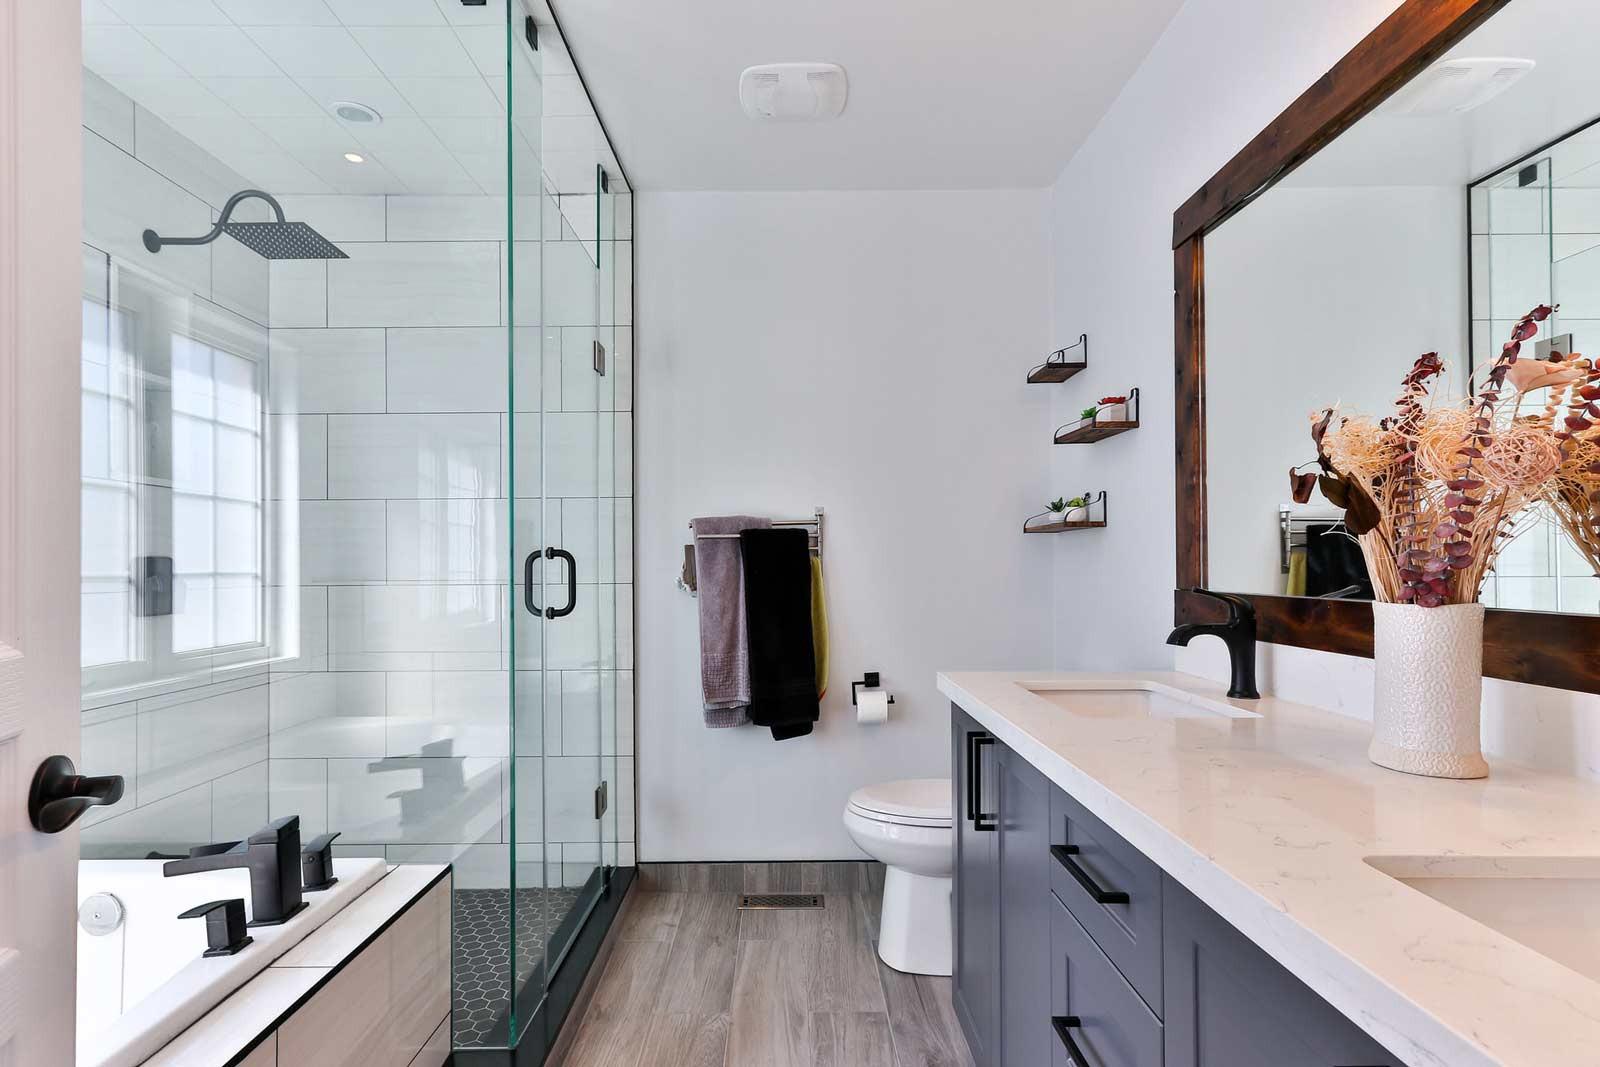 fr-bathroom-5.jpg